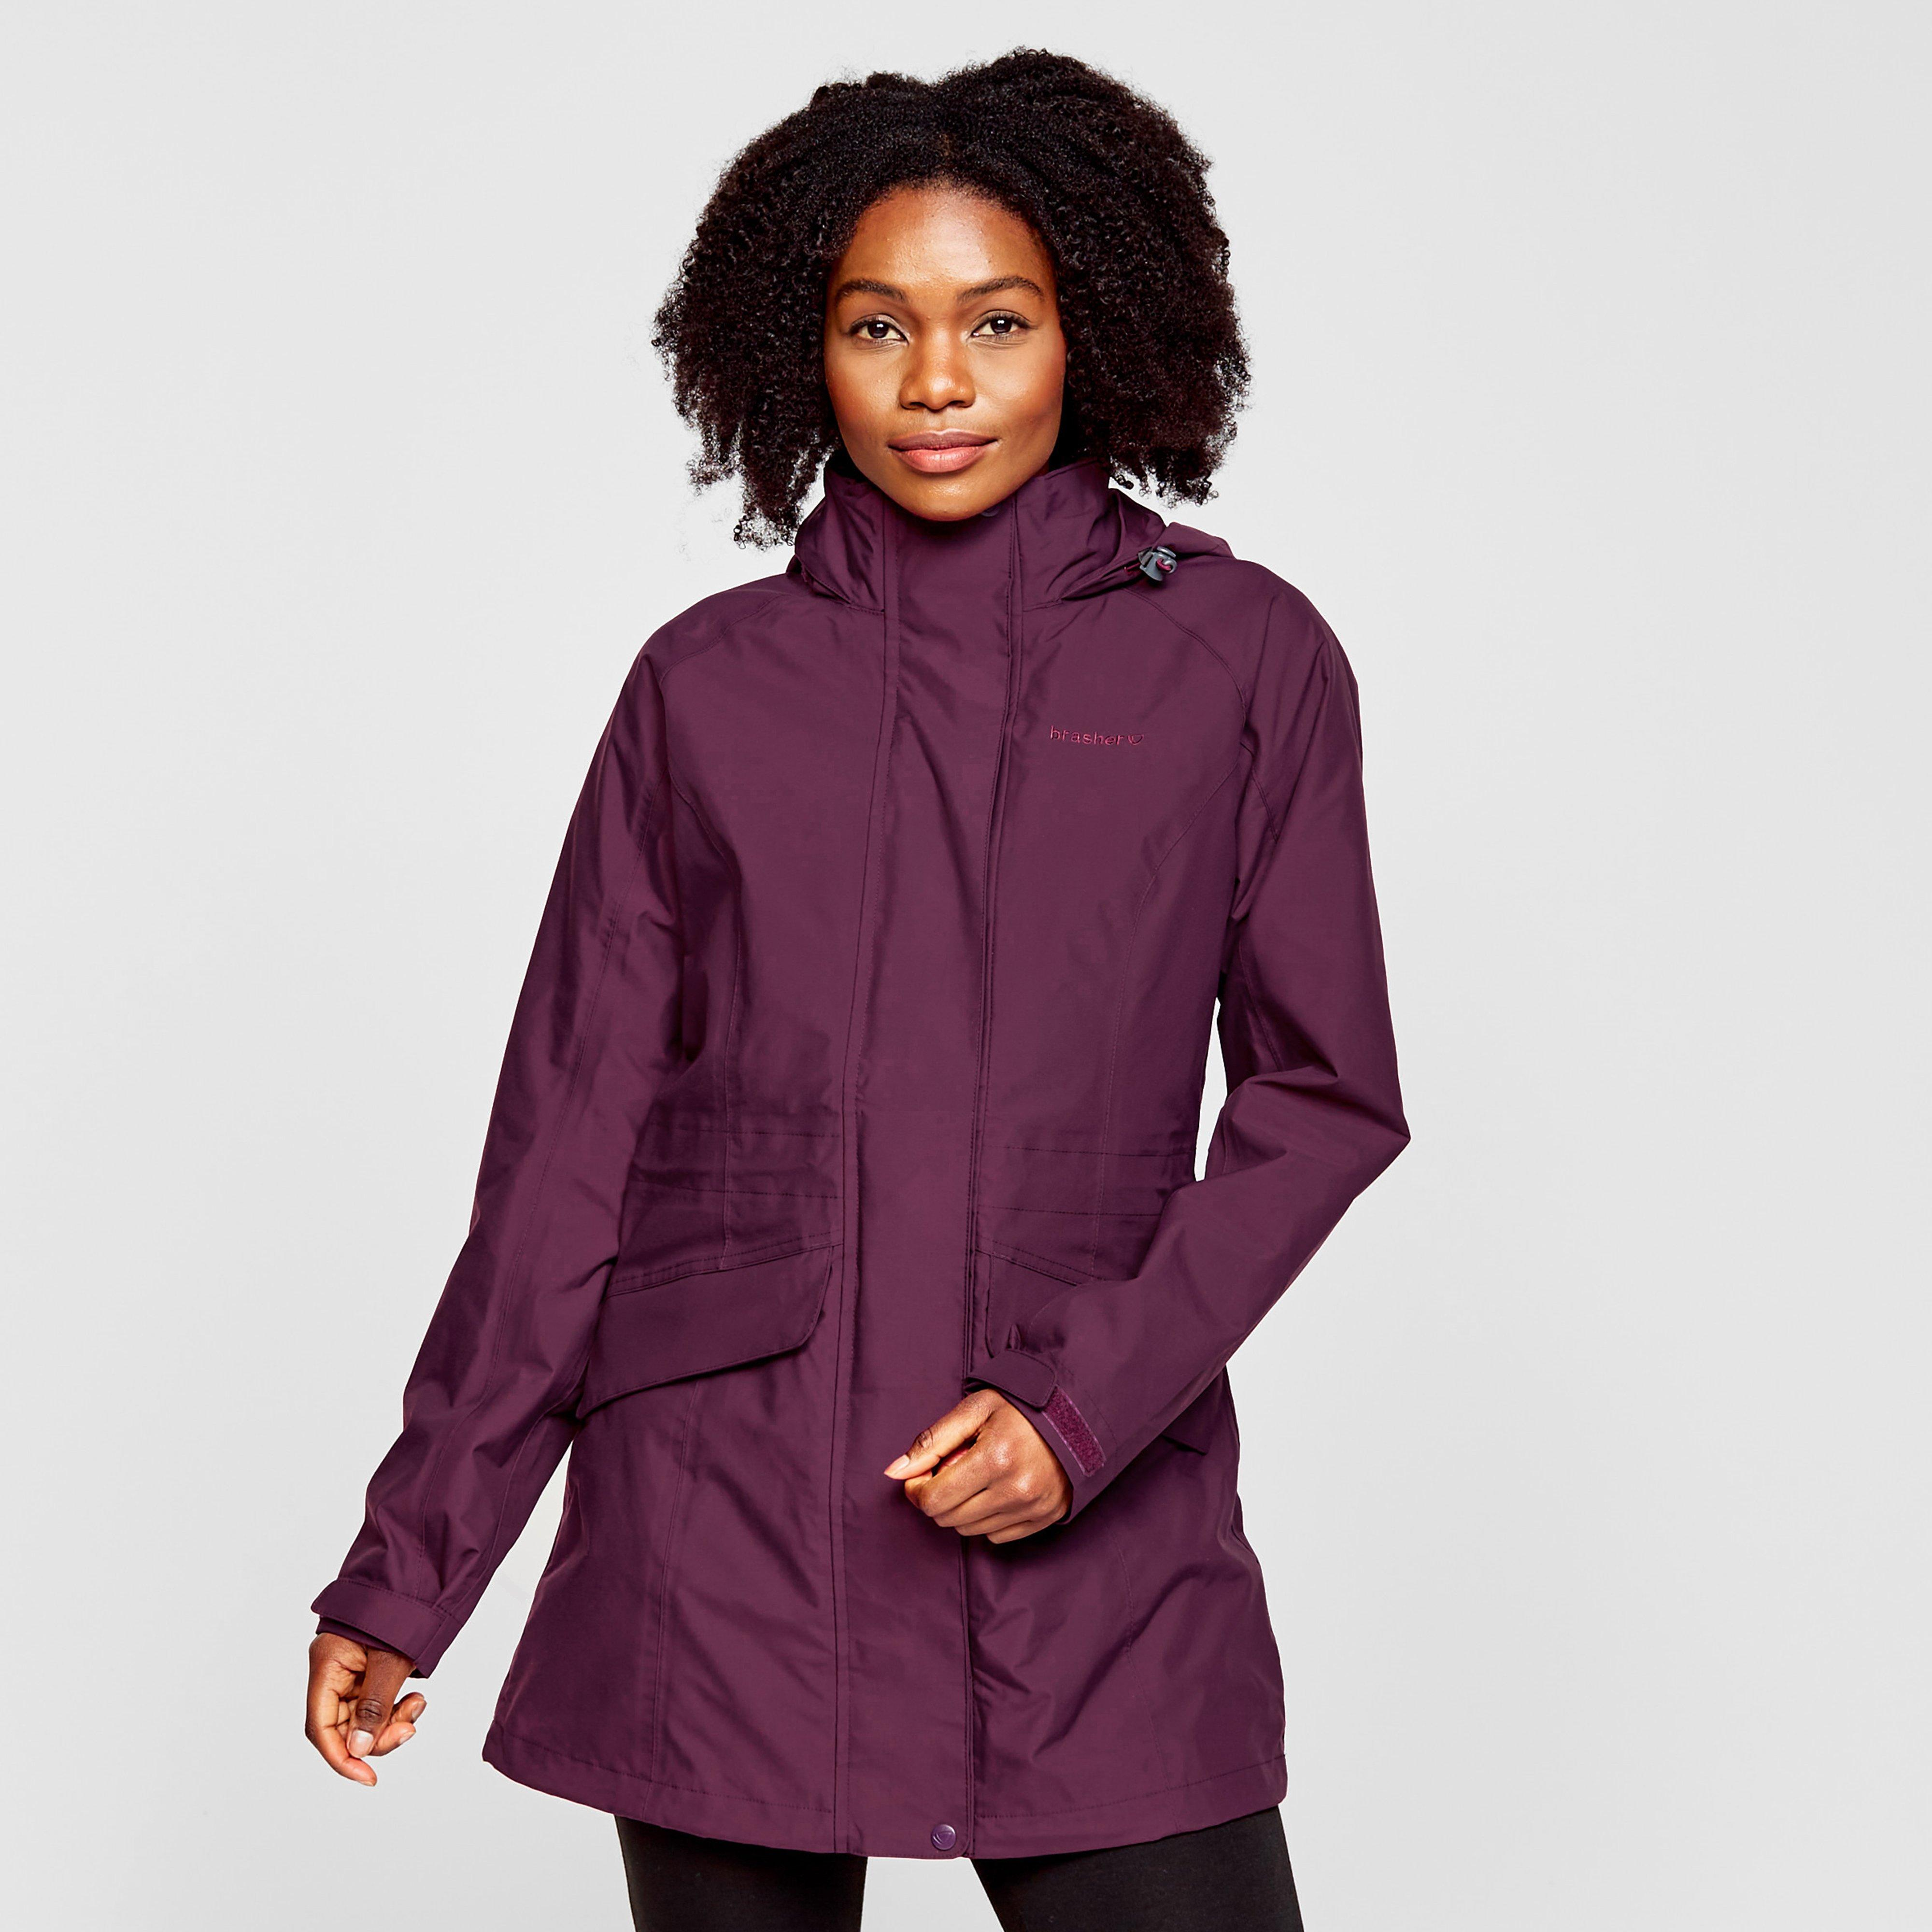 Brasher Womens Grisedale Jacket - Purple/plm  Purple/plm